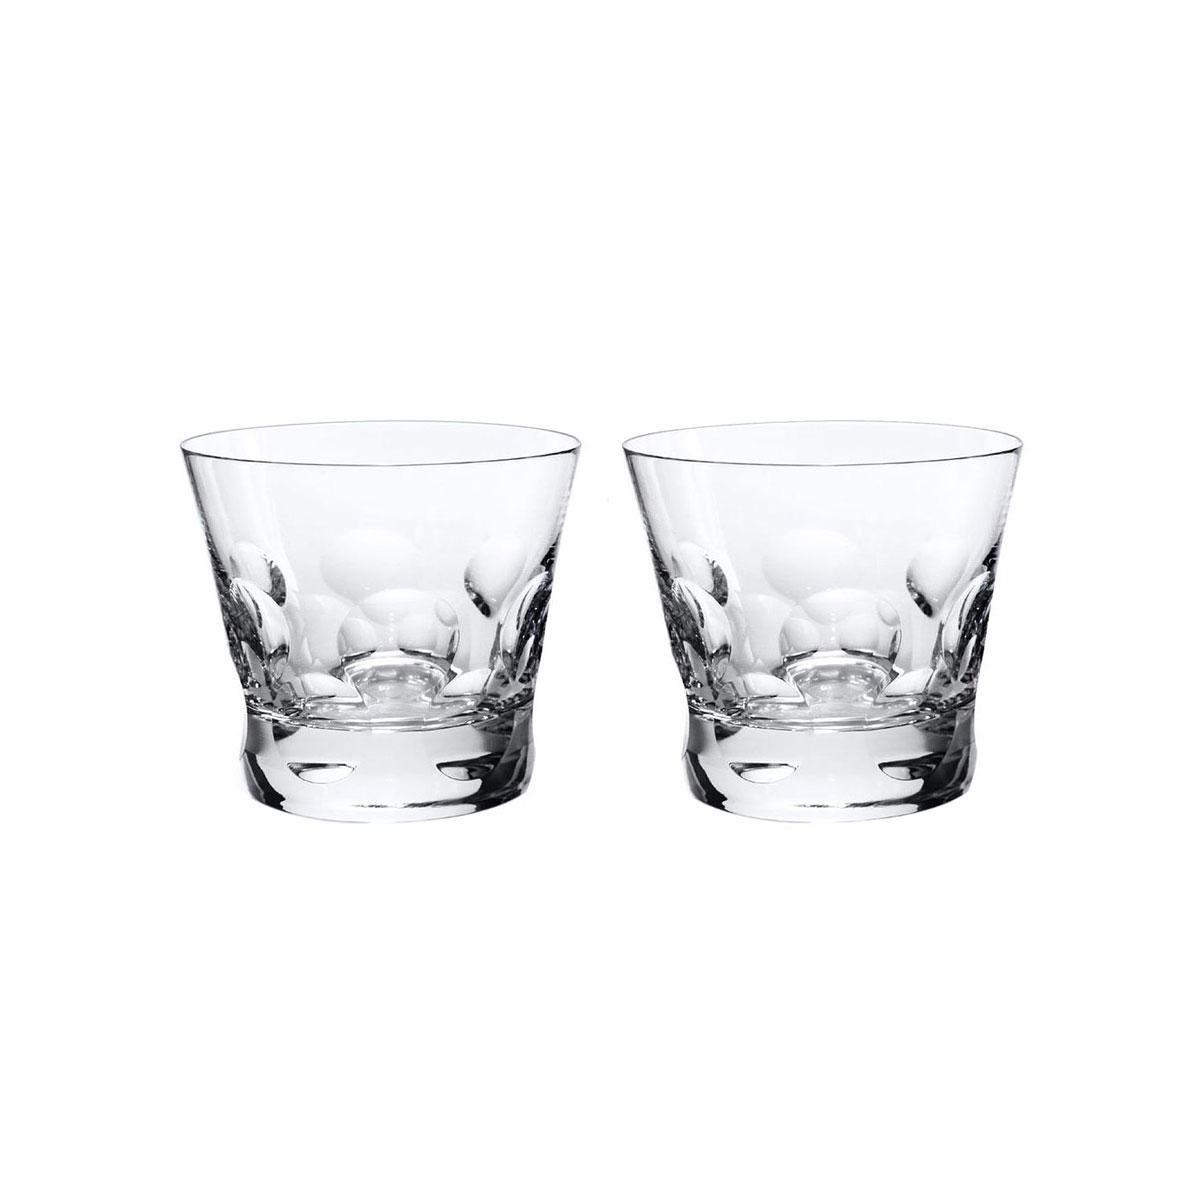 Baccarat Crystal, Beluga Crystal Tumber OF #3, Pair